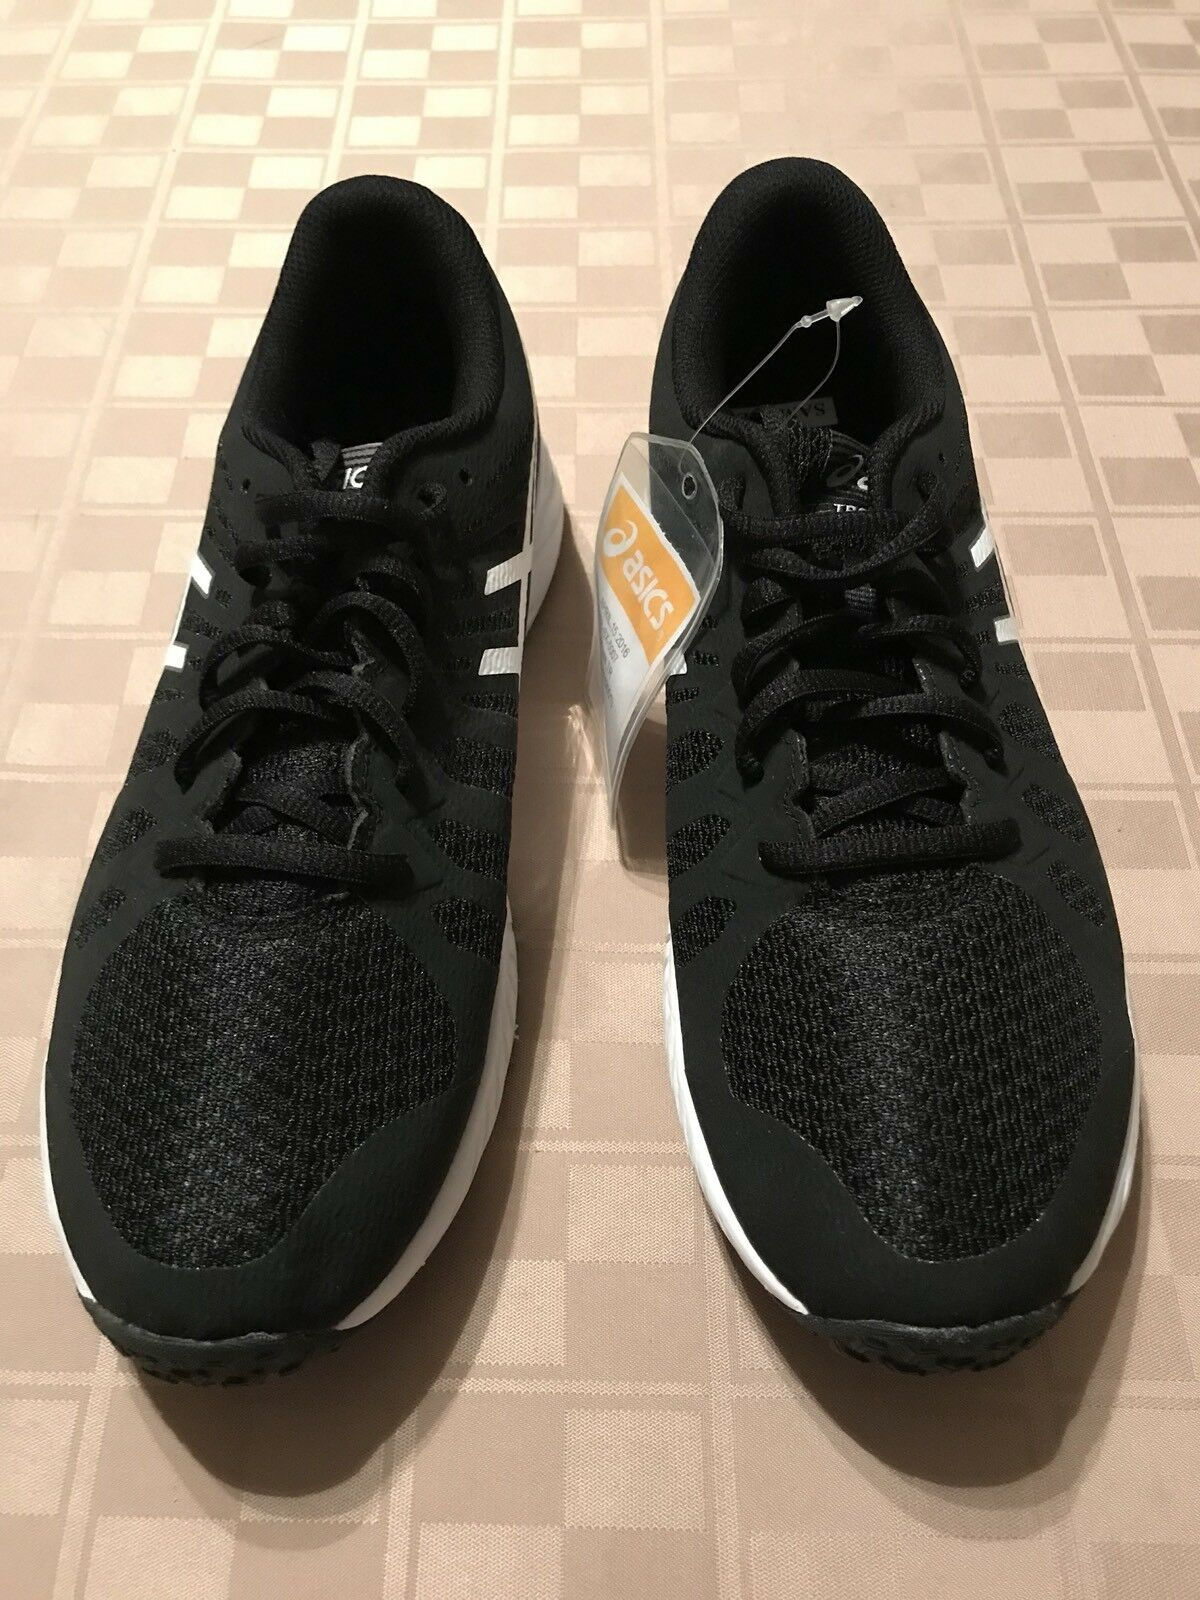 ASICS Nitro Fuze Men's TR NEW SAMPLE US size 9 Black white Running shoes